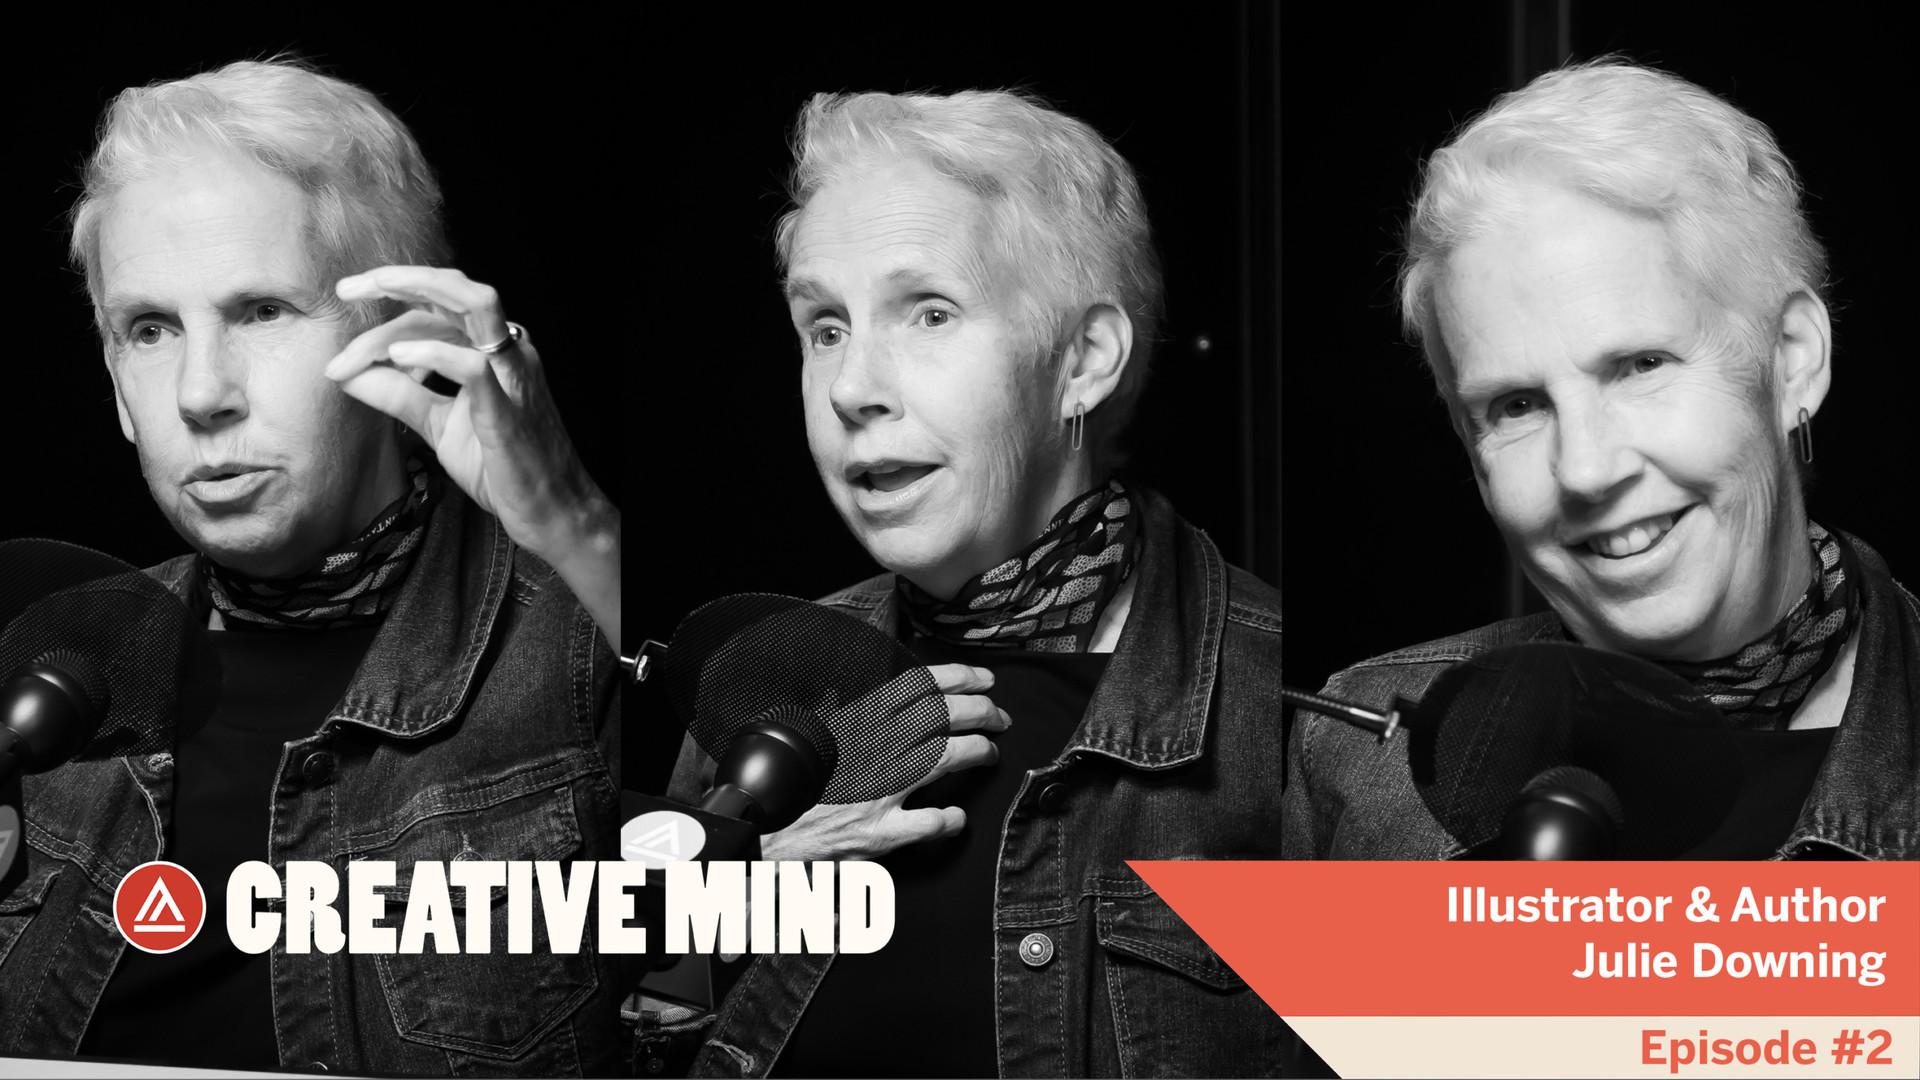 Creative Mind - Julie Downing